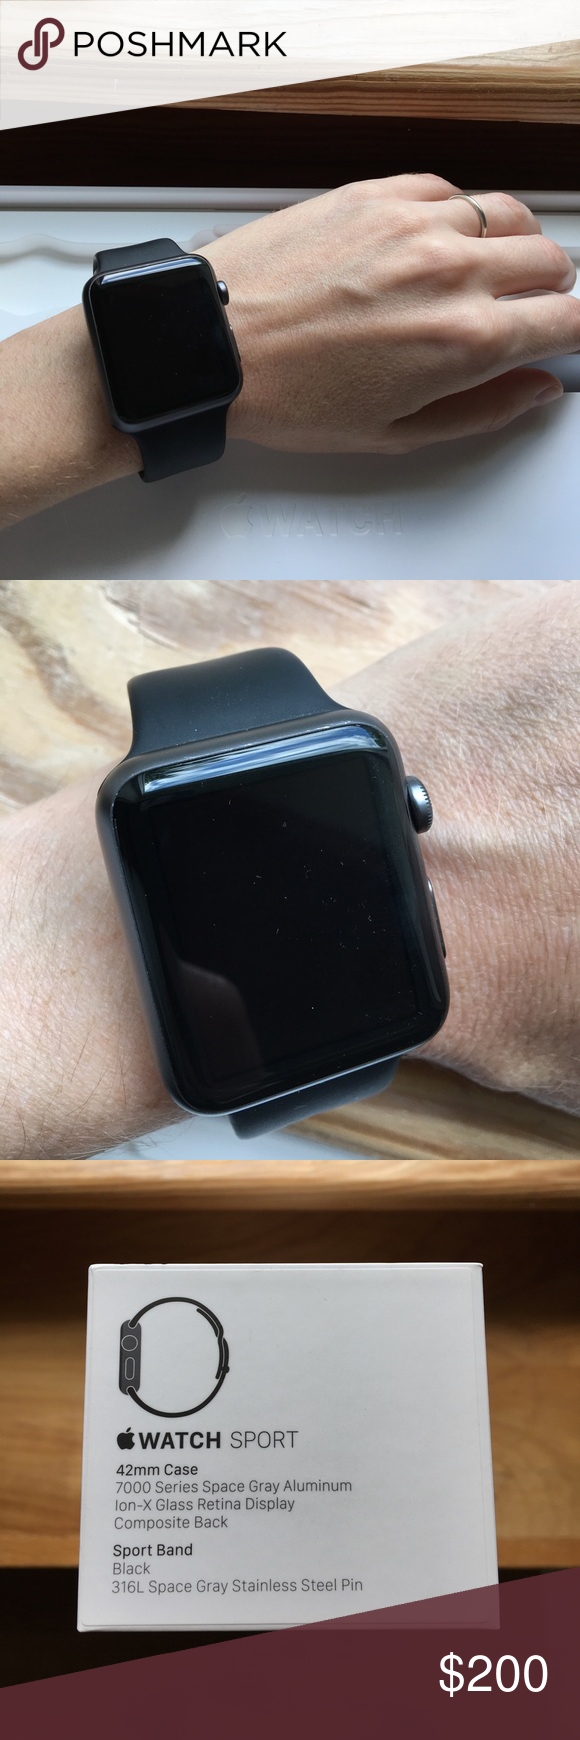 42mm Apple Watch Case, X-Doria Defense Edge Premium Aluminum & TPU Bumper Frame - Compatible with Apple Watch Series 1, Series 2, Series 3 and Nike+, (Silver/Grey)